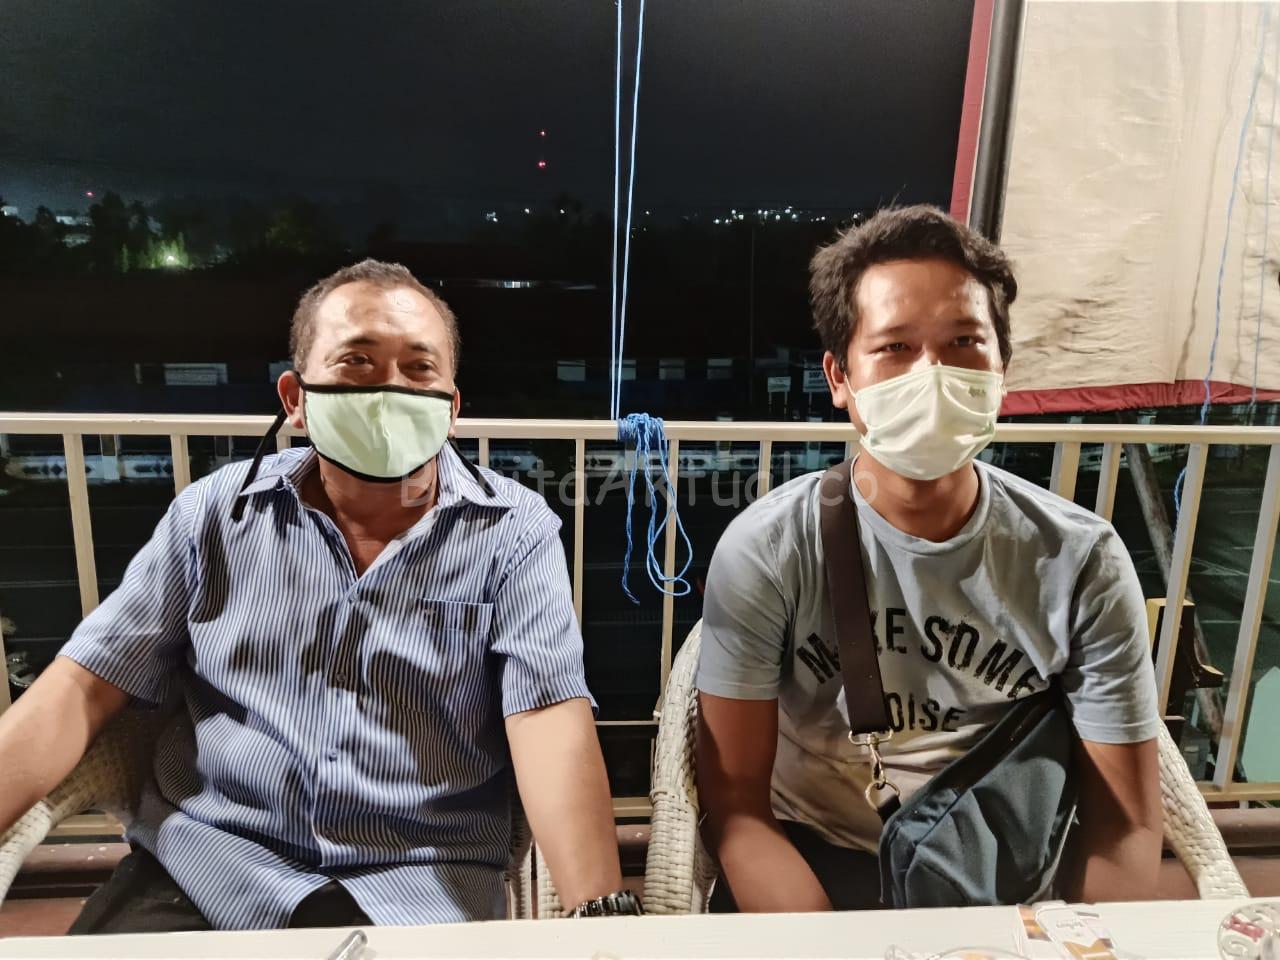 Polres Manokwari Bersama Polda PB Berhasil Tangkap 10 Pelaku Begal Yang Berusia Dibawah Umur 24 IMG 20200506 WA0029